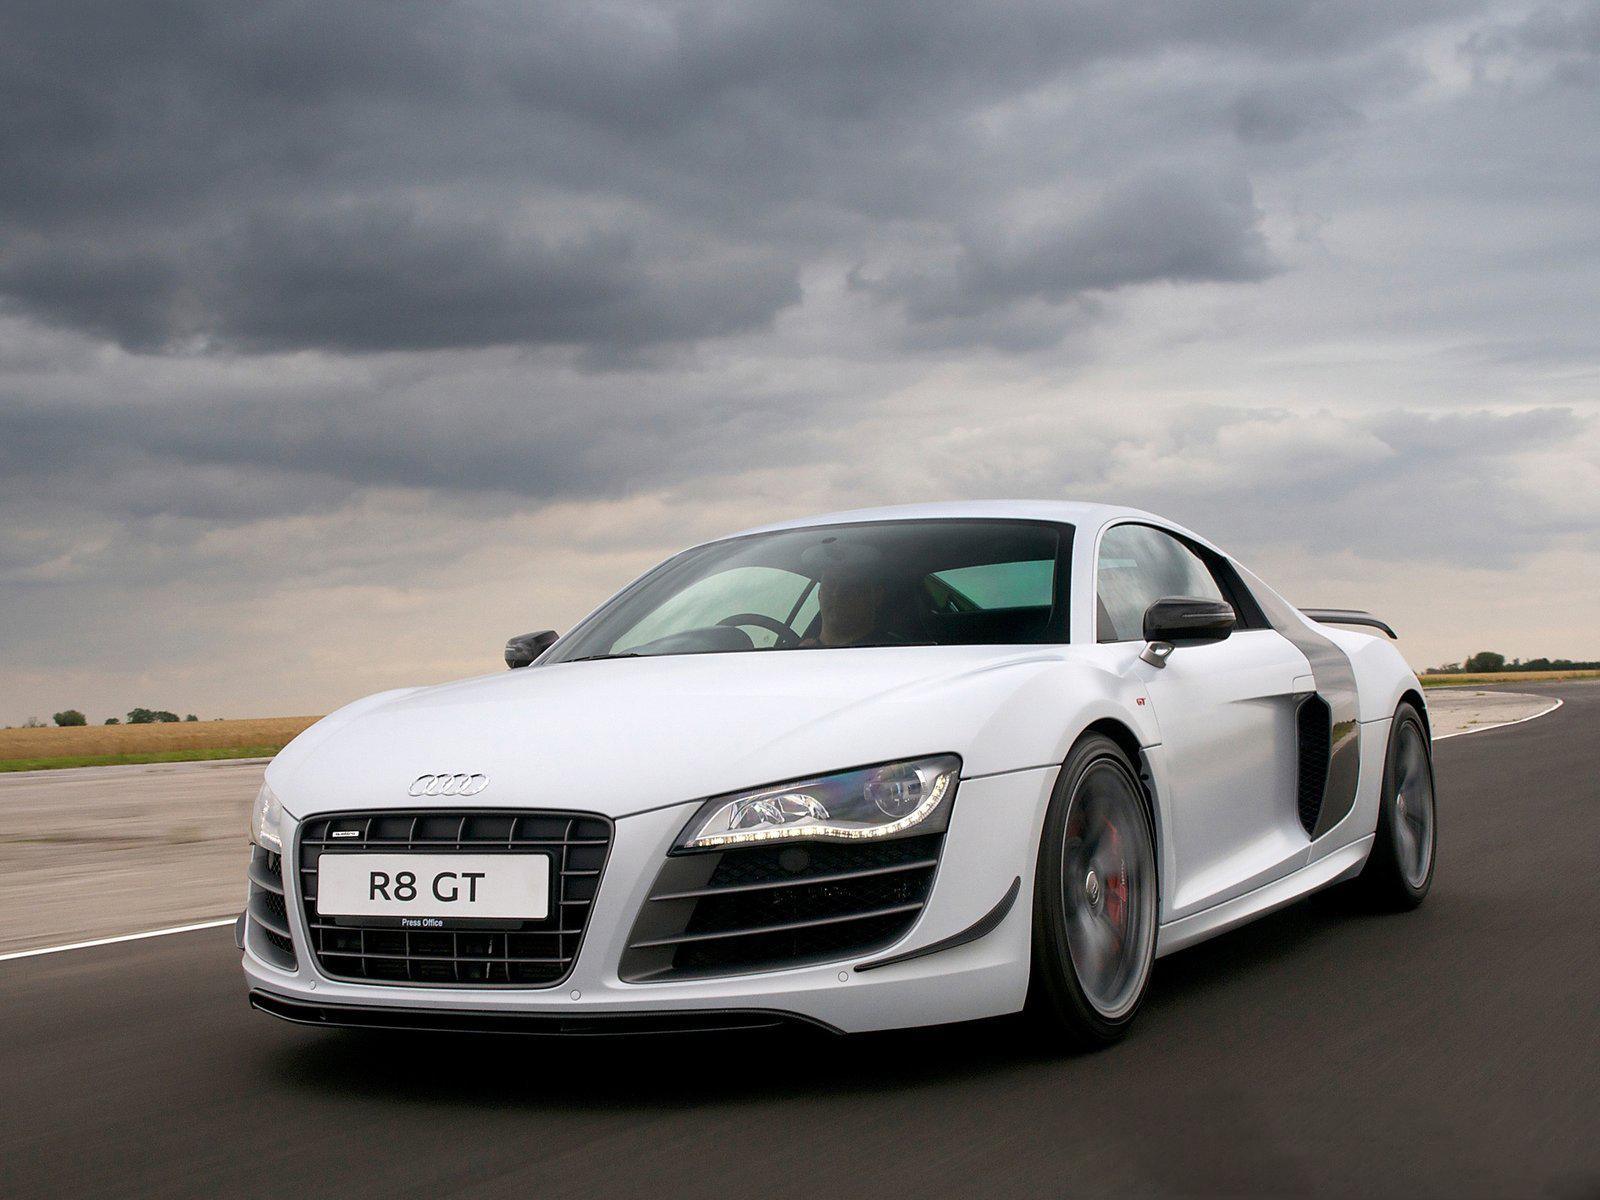 Audi r8 gt front view